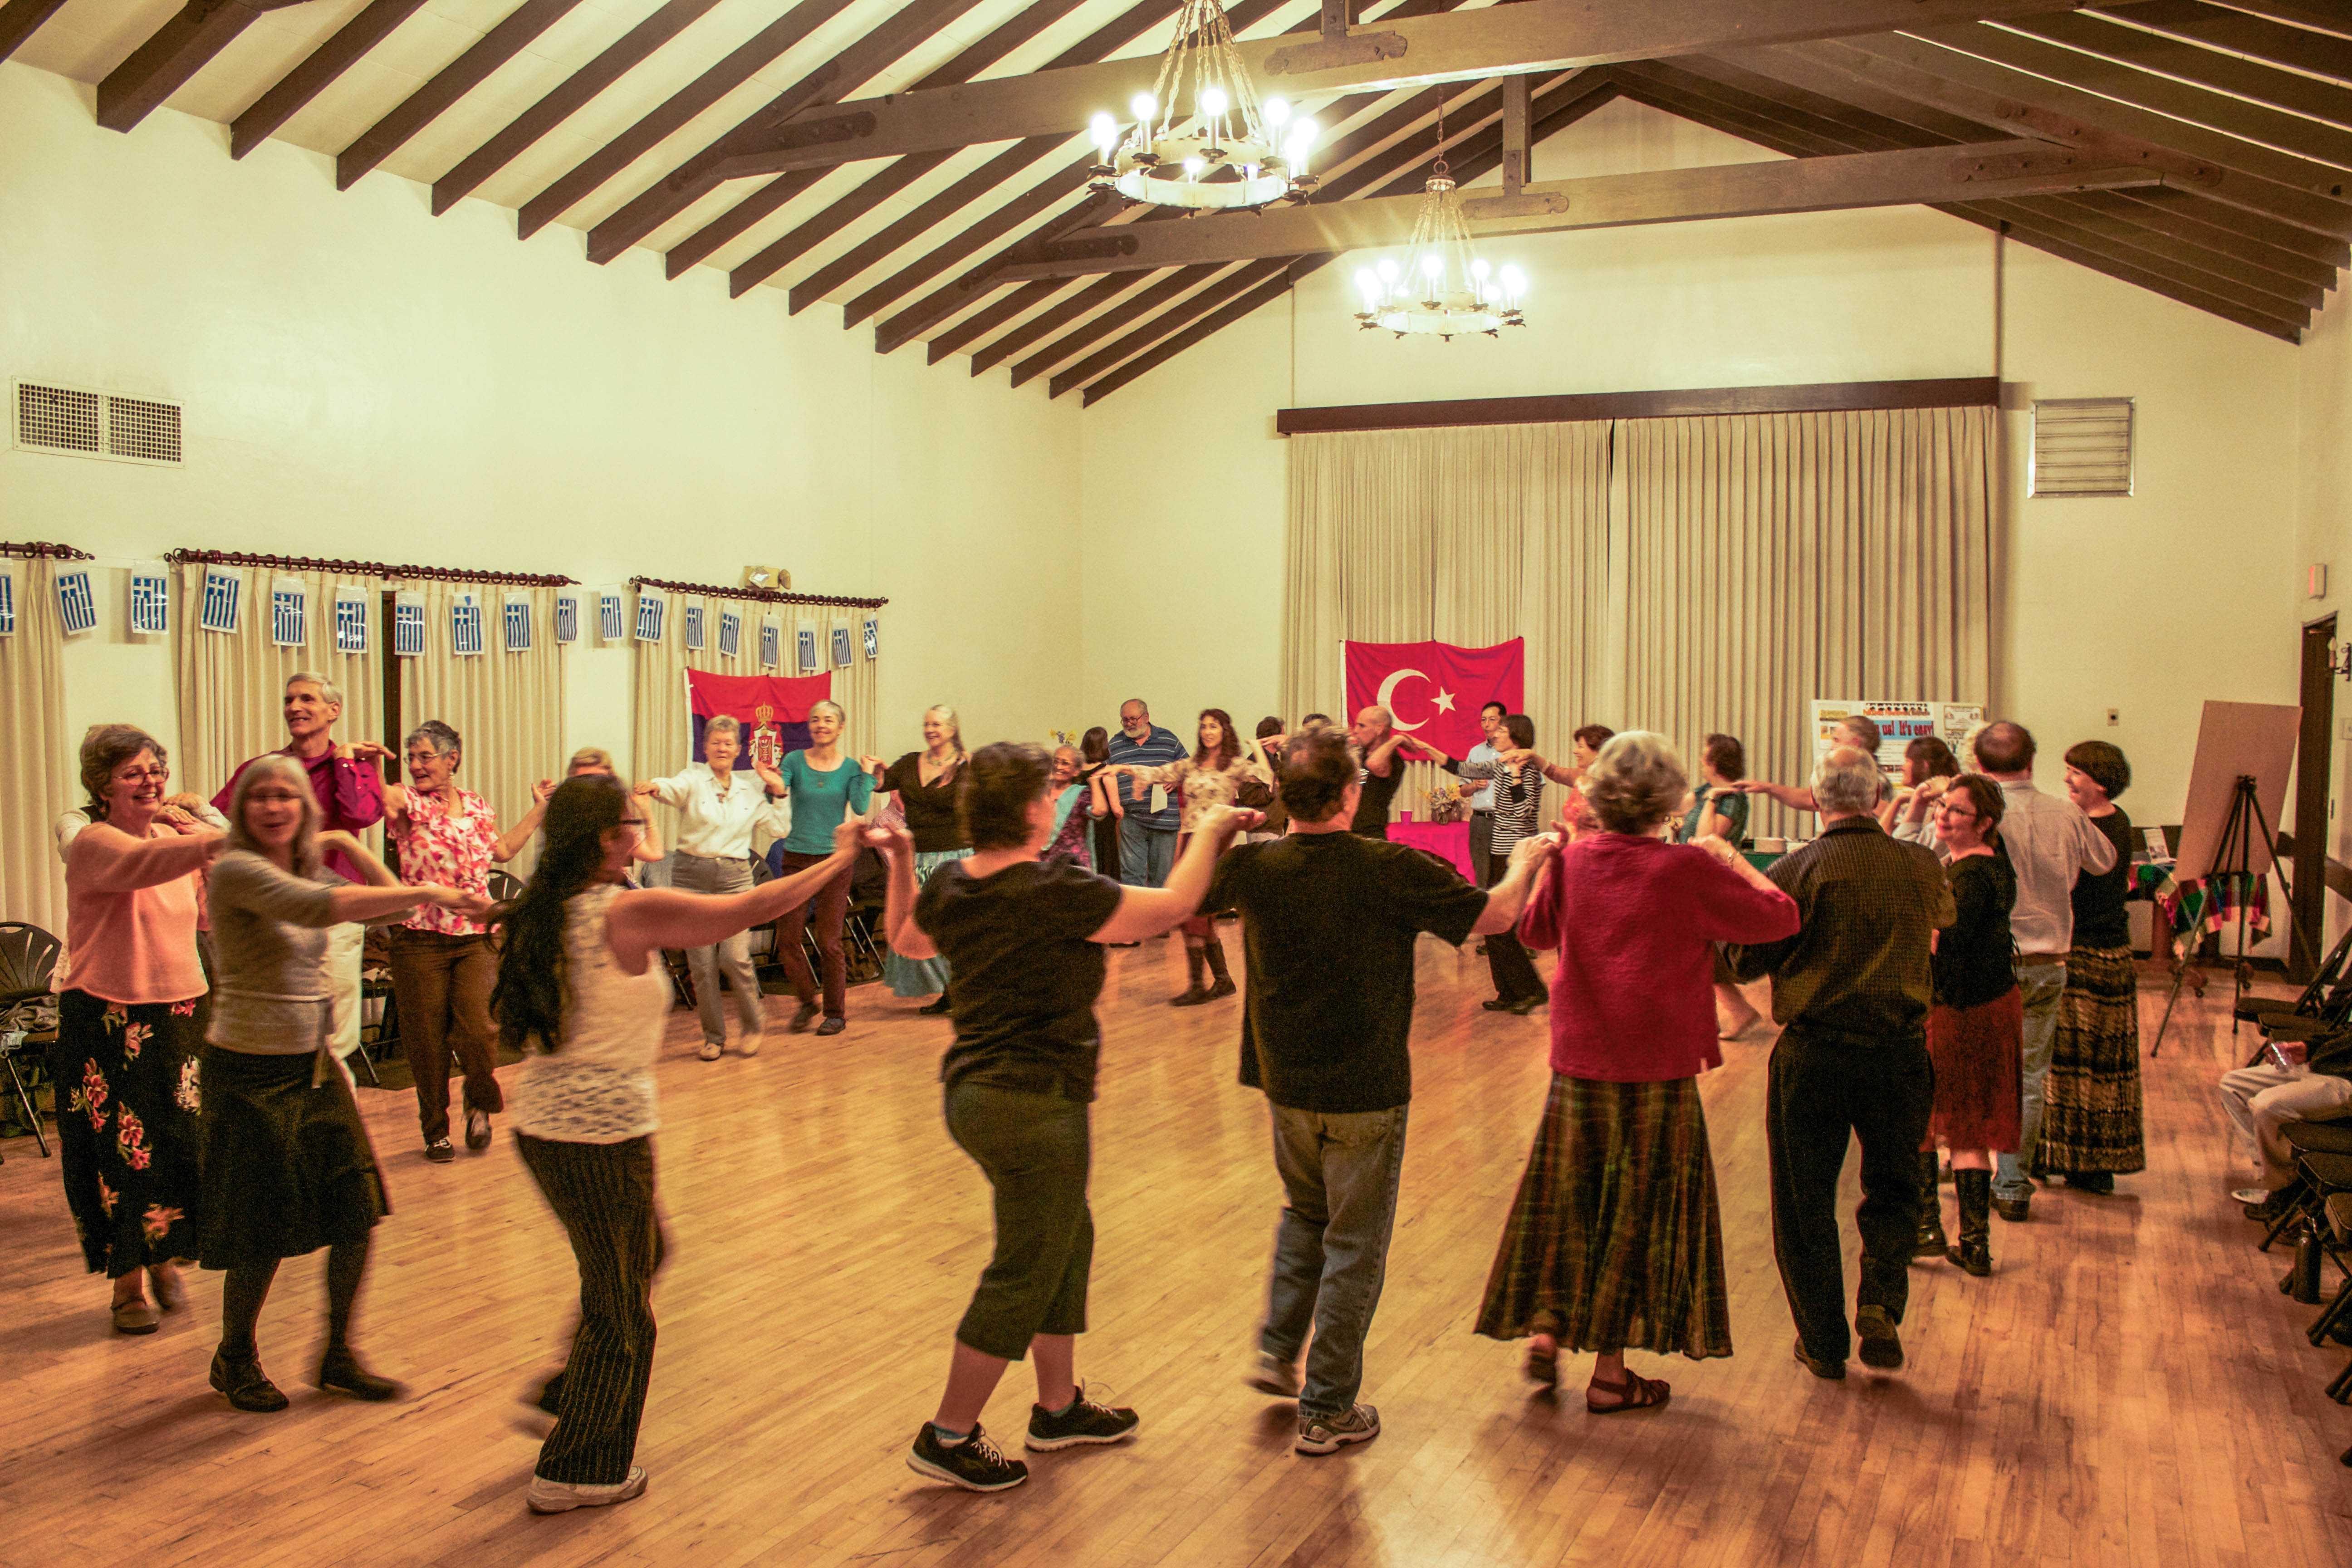 Community gathers for global folk dance